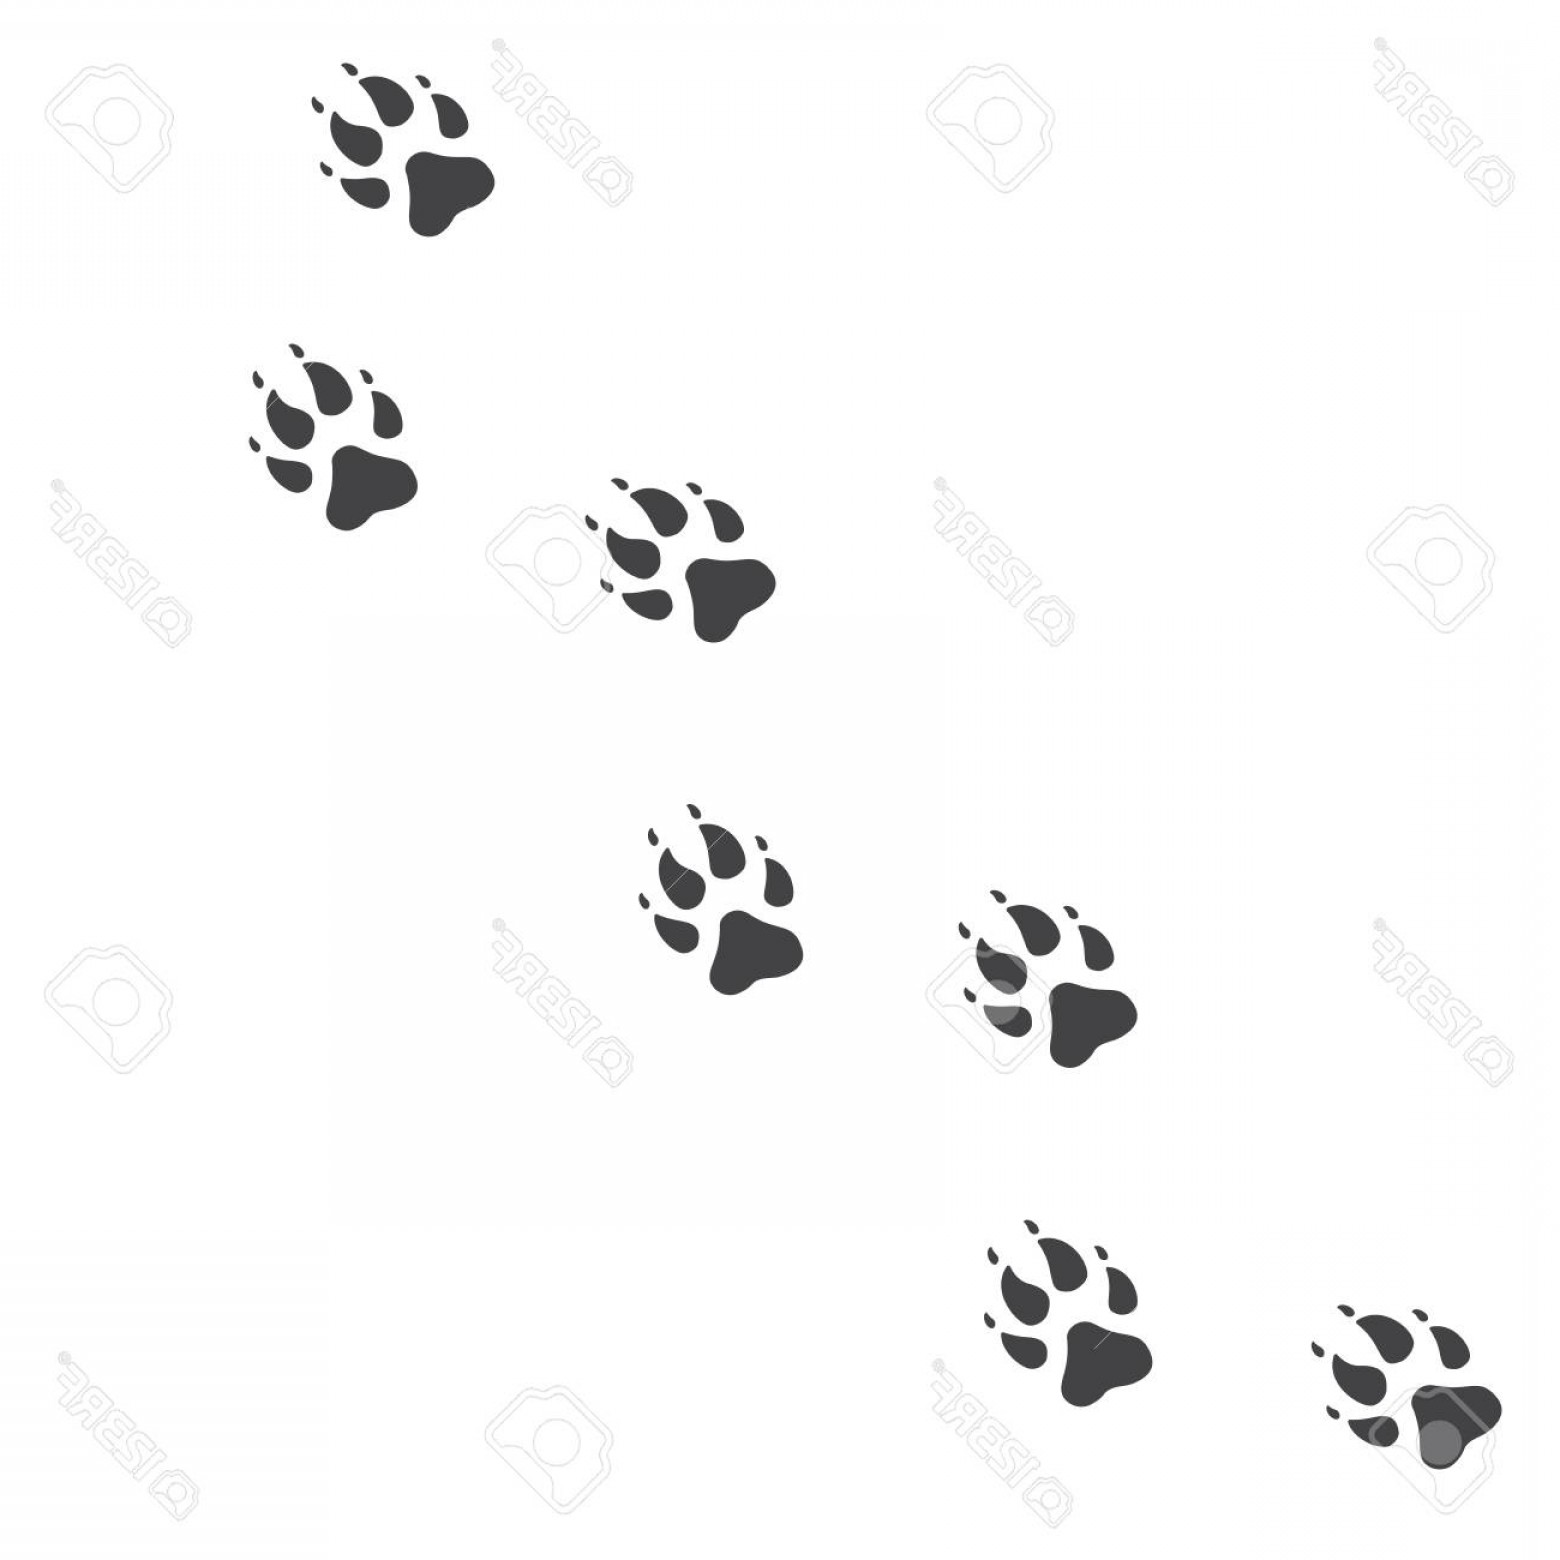 1560x1560 Photostock Vector Vector Illustration Wolf Paw Prints Track Icon